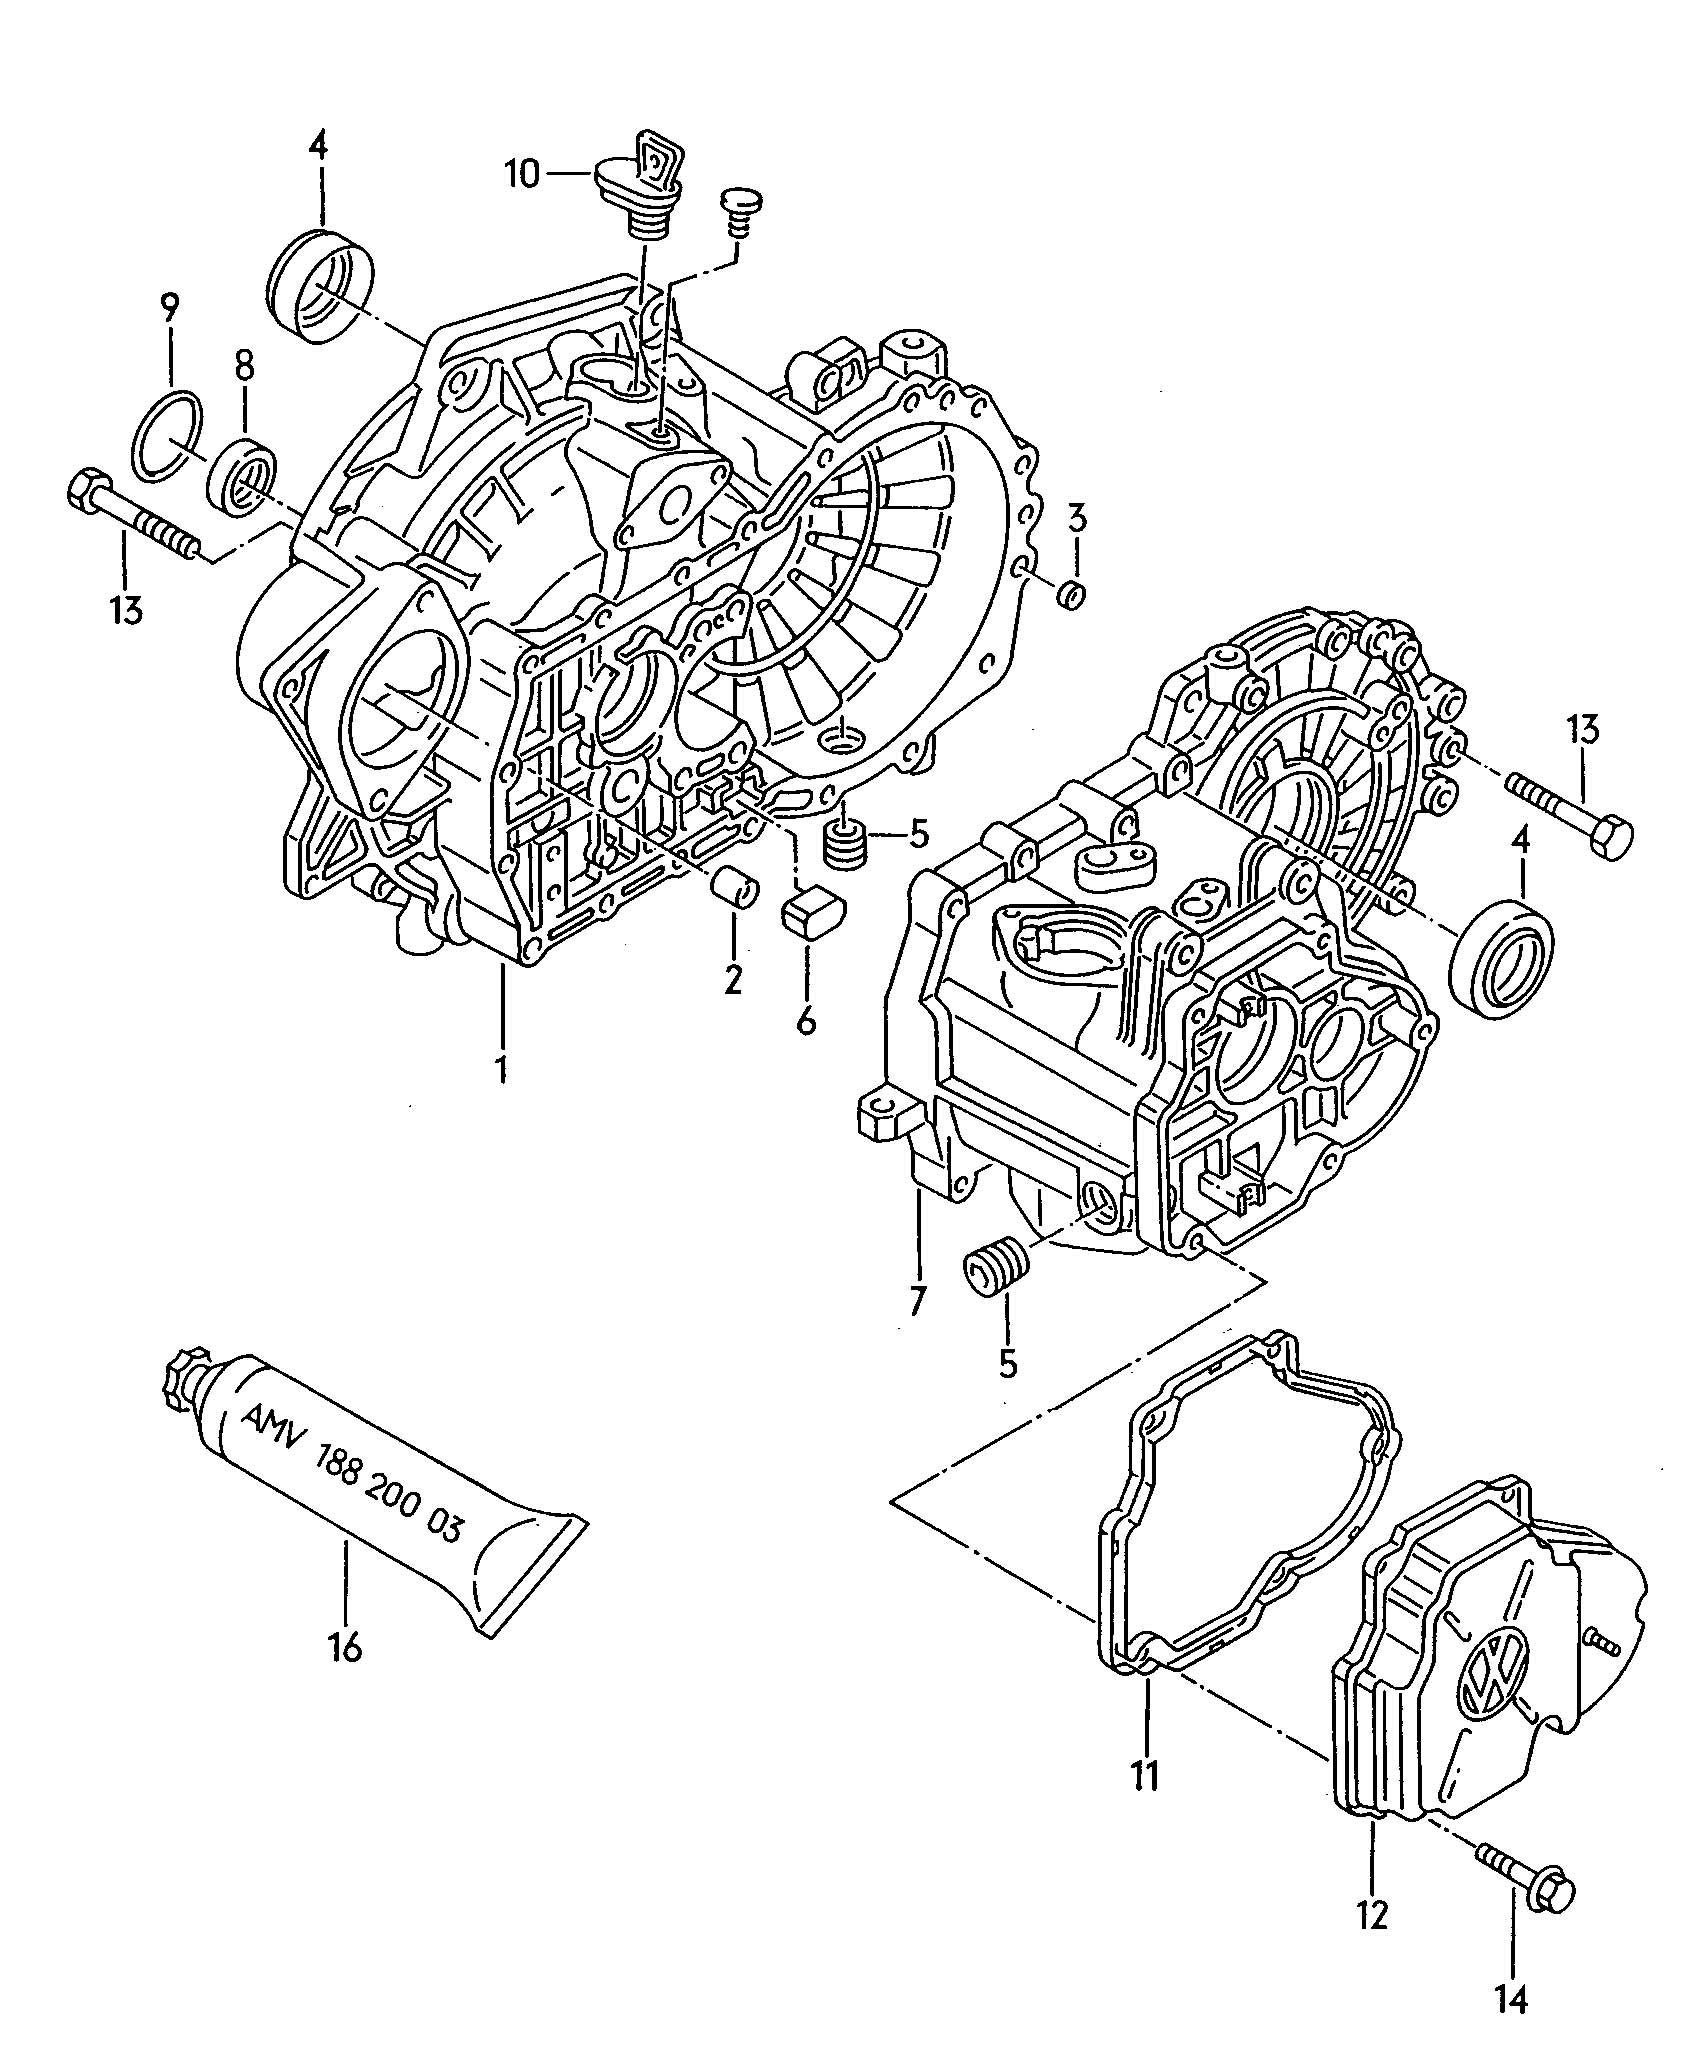 Nissan navara wiring diagram facbooik